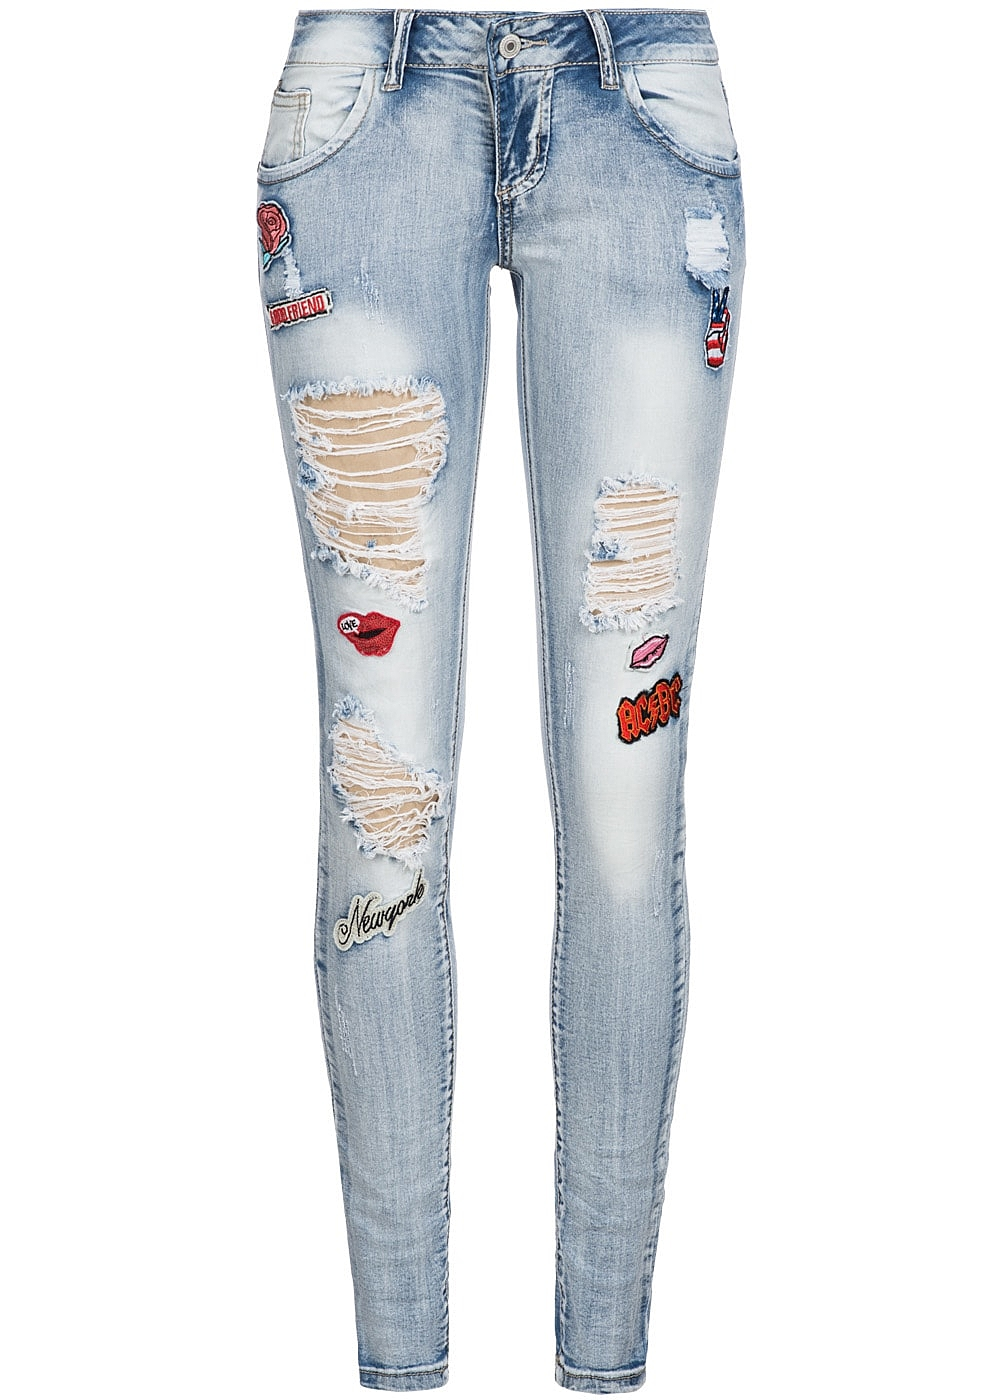 seventyseven lifestyle hose damen jeans destroy look patches 5 pockets hell blau dn 77onlineshop. Black Bedroom Furniture Sets. Home Design Ideas